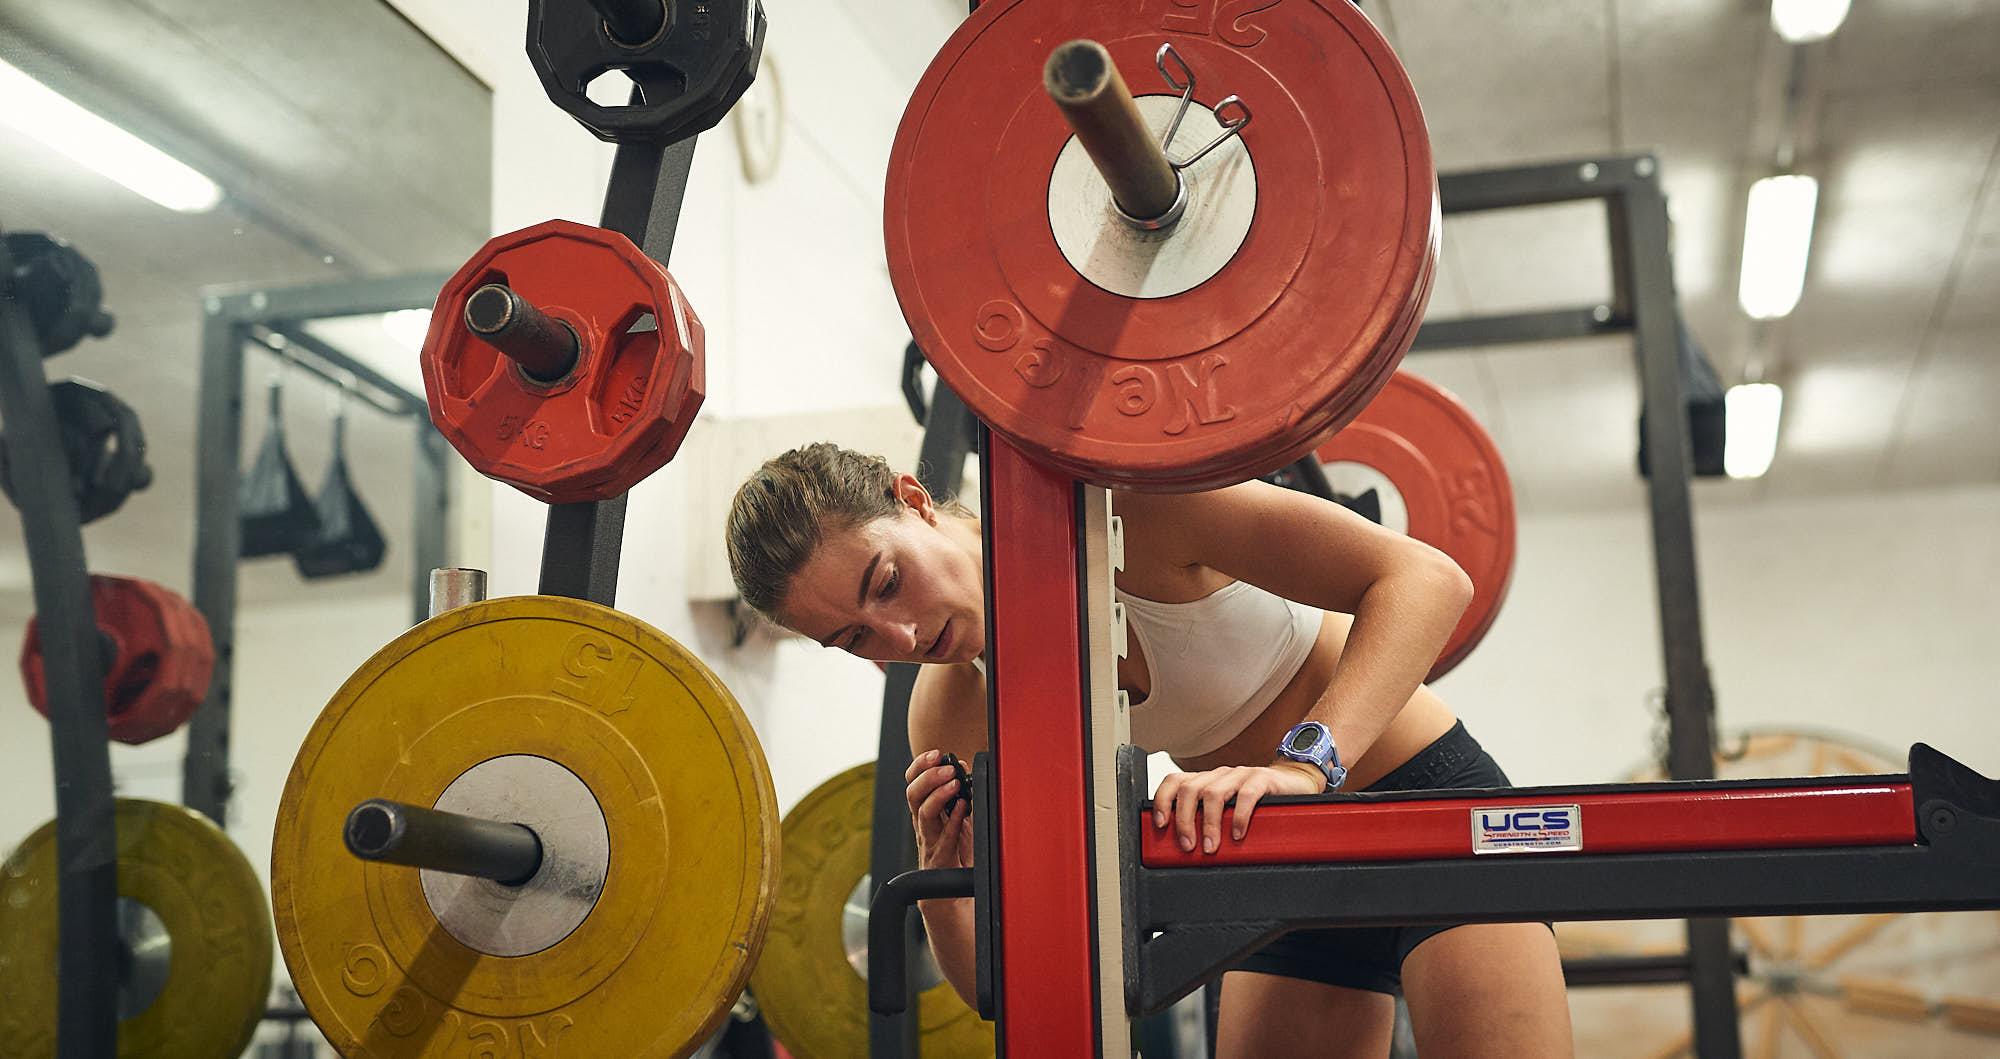 Bianca Baak hurdles athlete in a gym